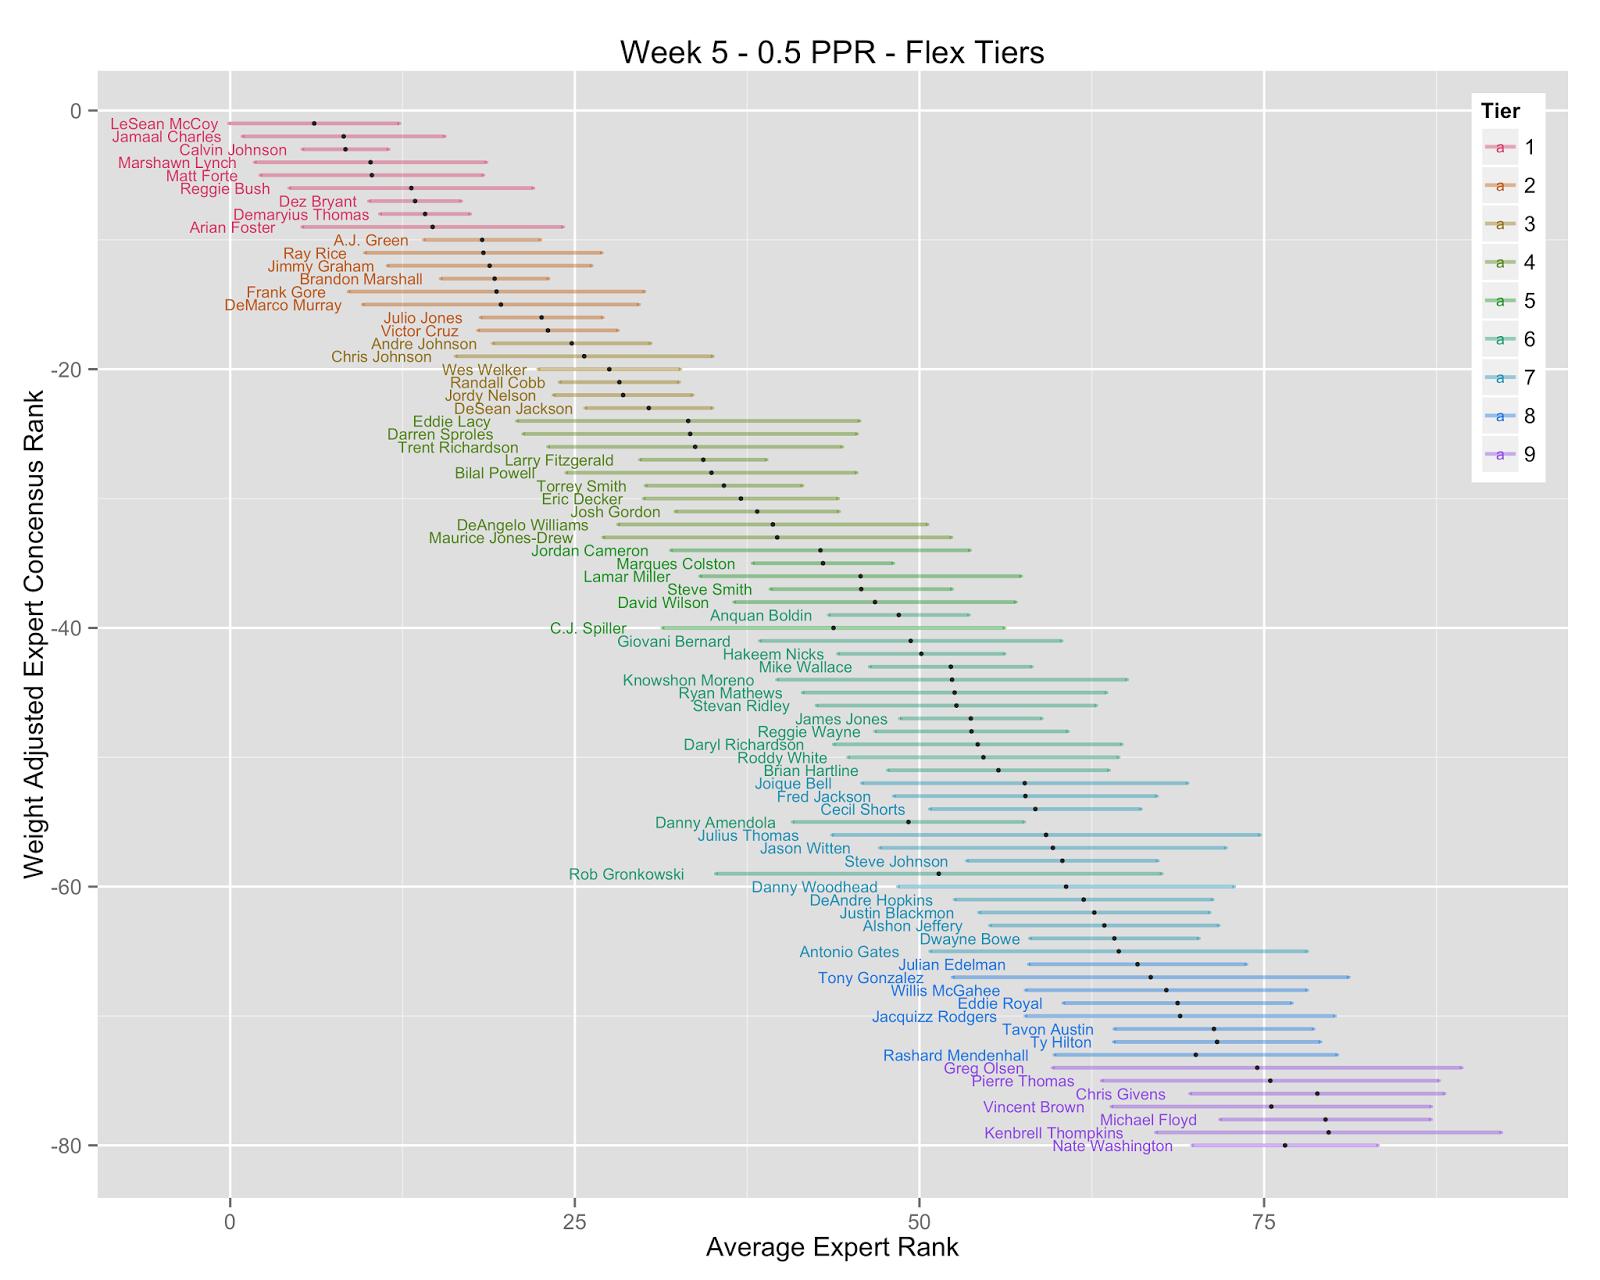 Data Math Etc Week 5 Half Ppr Let's look closer at the top 25: data math etc week 5 half ppr